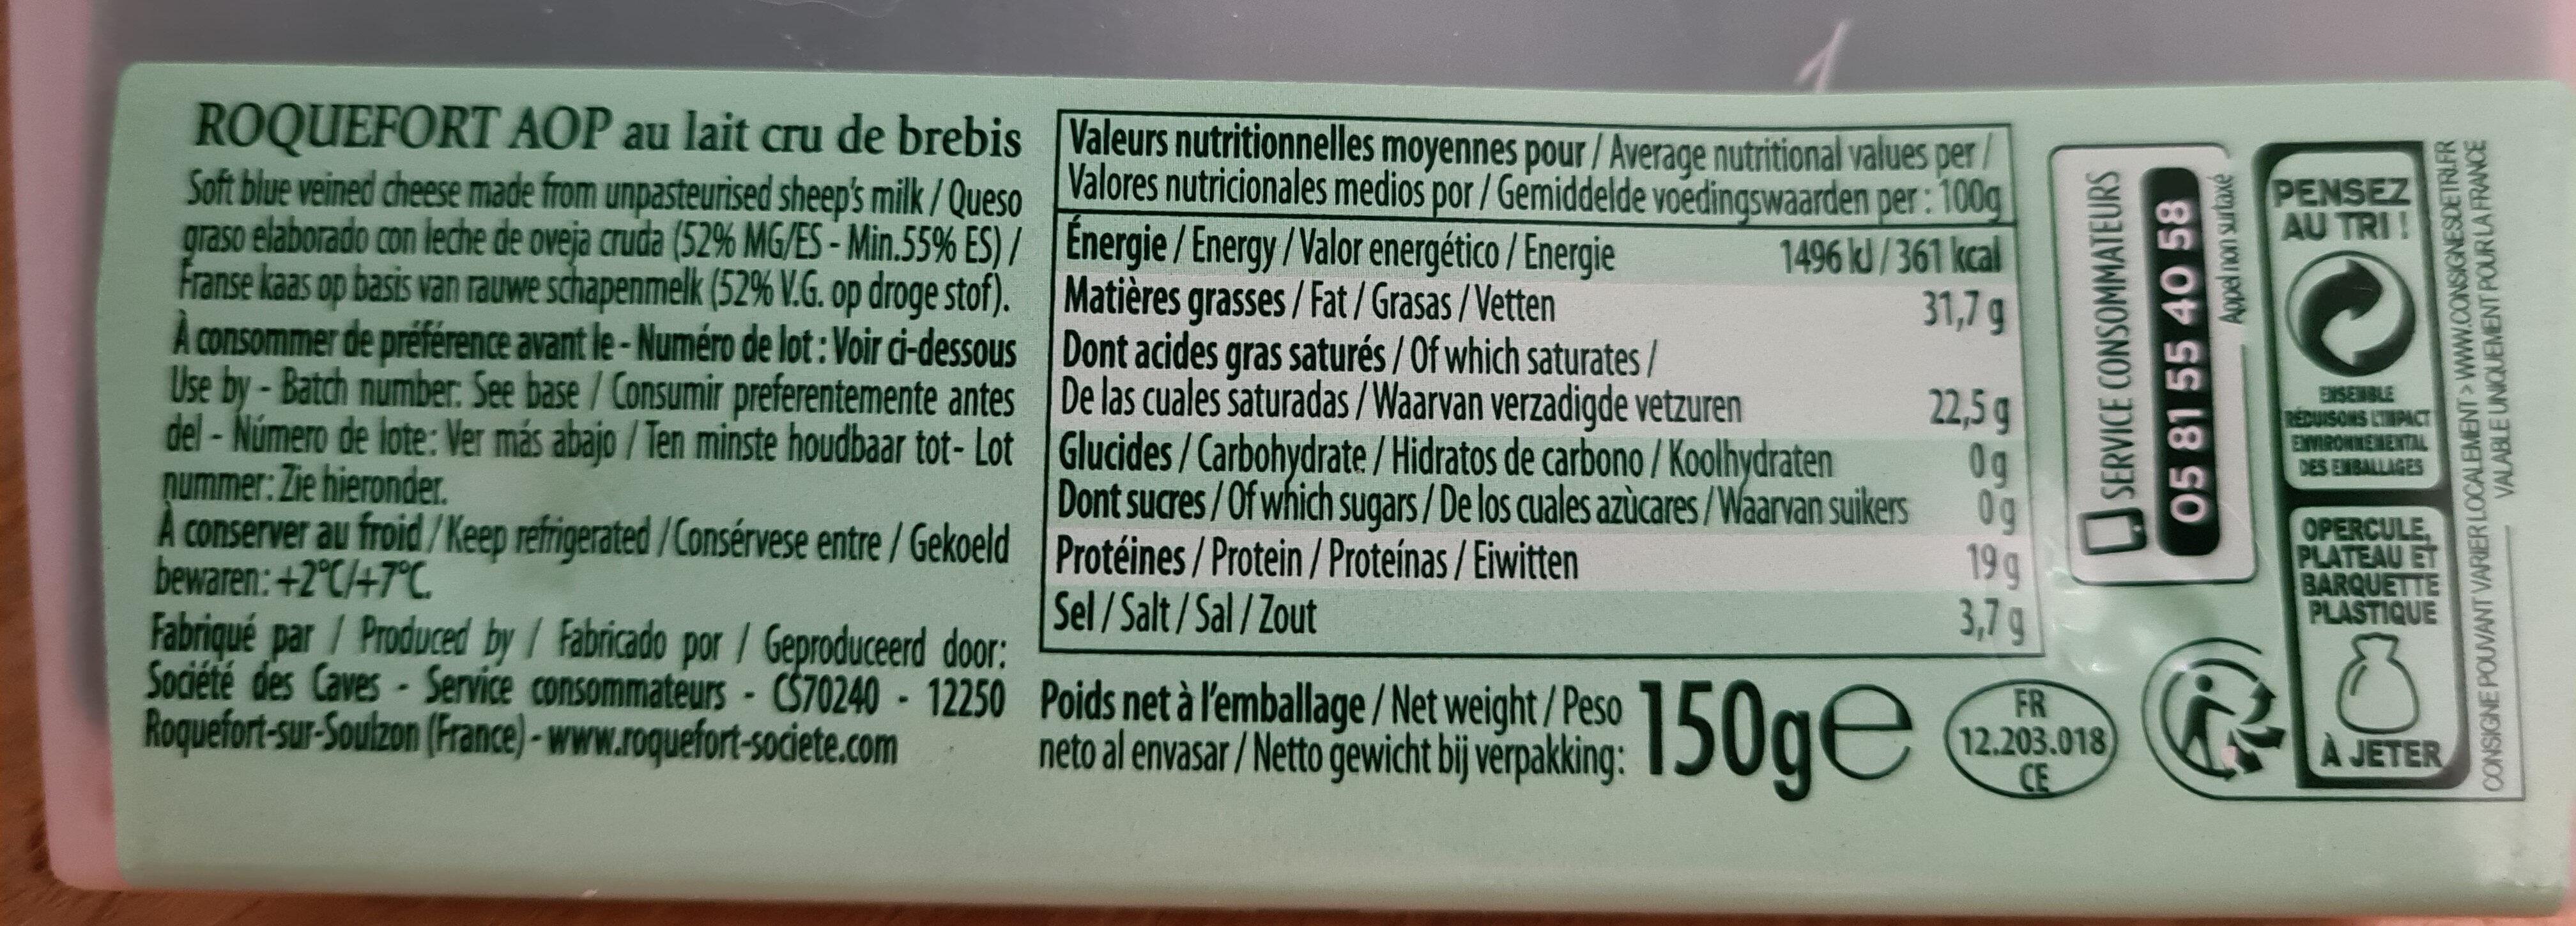 Roquefort Societe - Informations nutritionnelles - fr